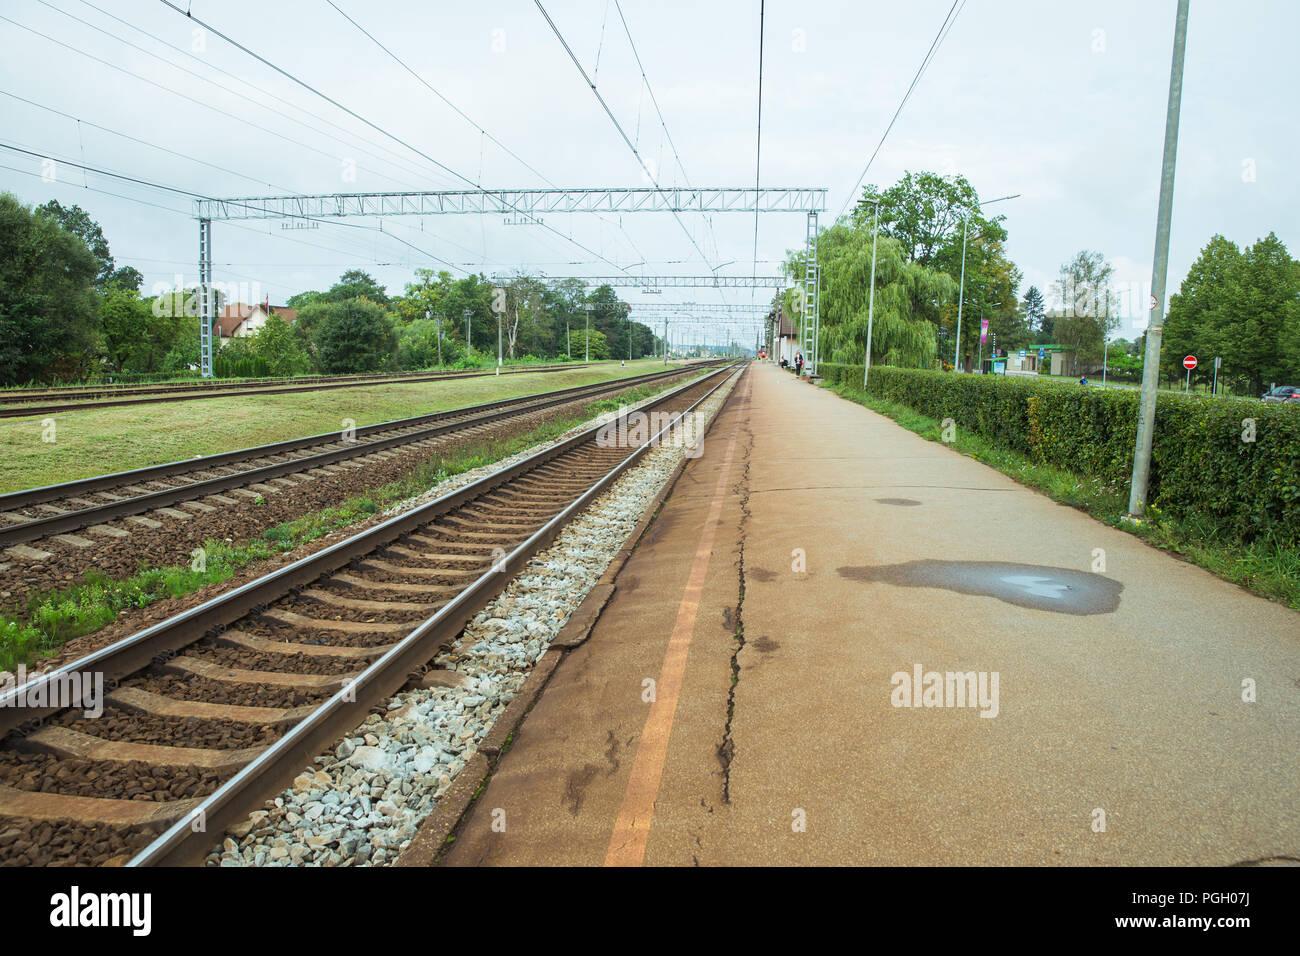 City Salaspils, Latvia. Tran station and iron ways. Urban city view, nature and industry. Travel photo 2018. - Stock Image